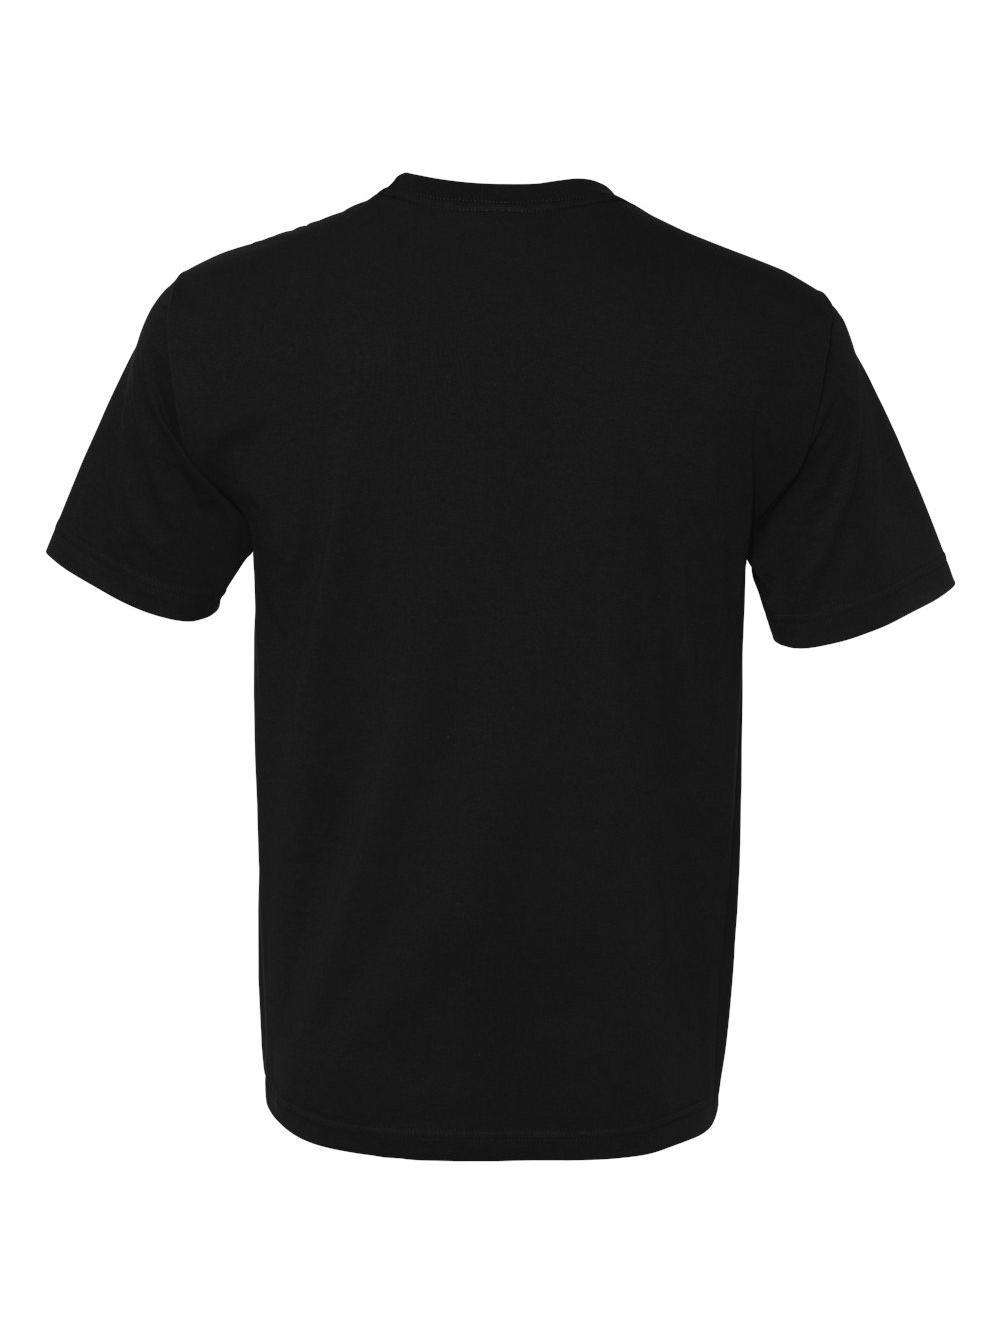 Bayside-USA-Made-100-Cotton-Short-Sleeve-T-Shirt-5040 thumbnail 4